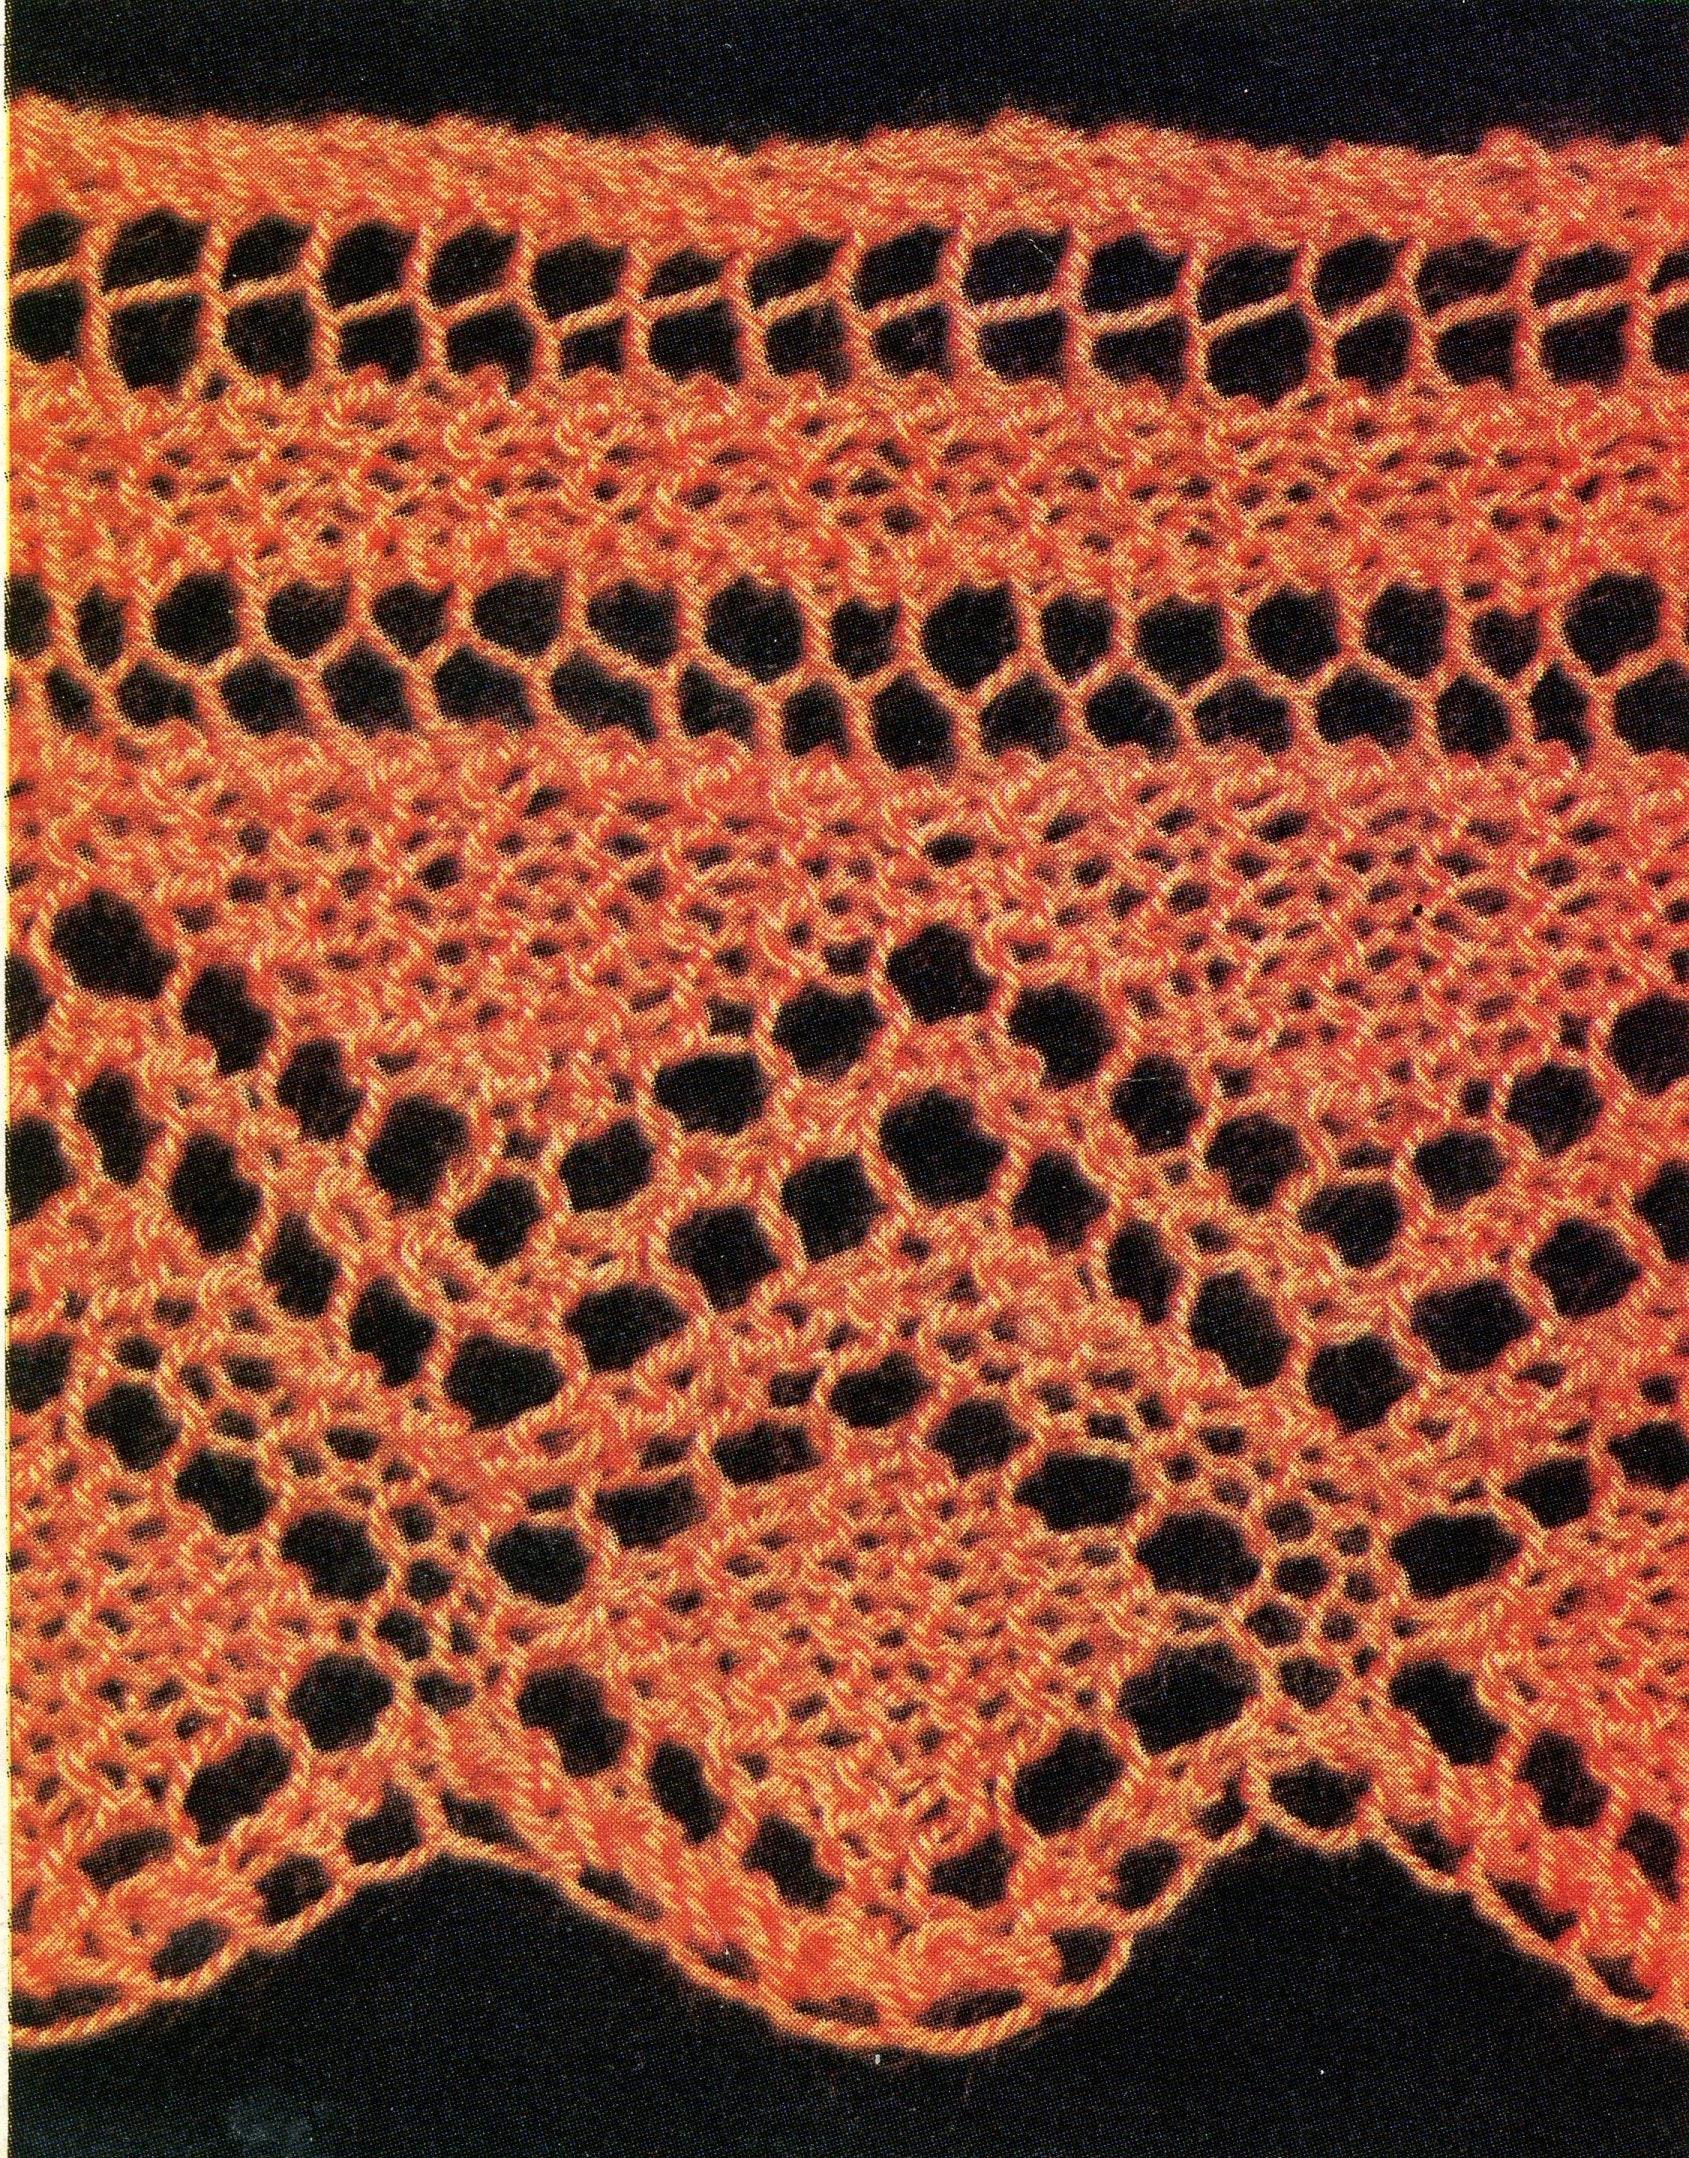 Diamond Trim Pillow + Sheet • 1970s Lace Knitting Patterns • Vintage ...